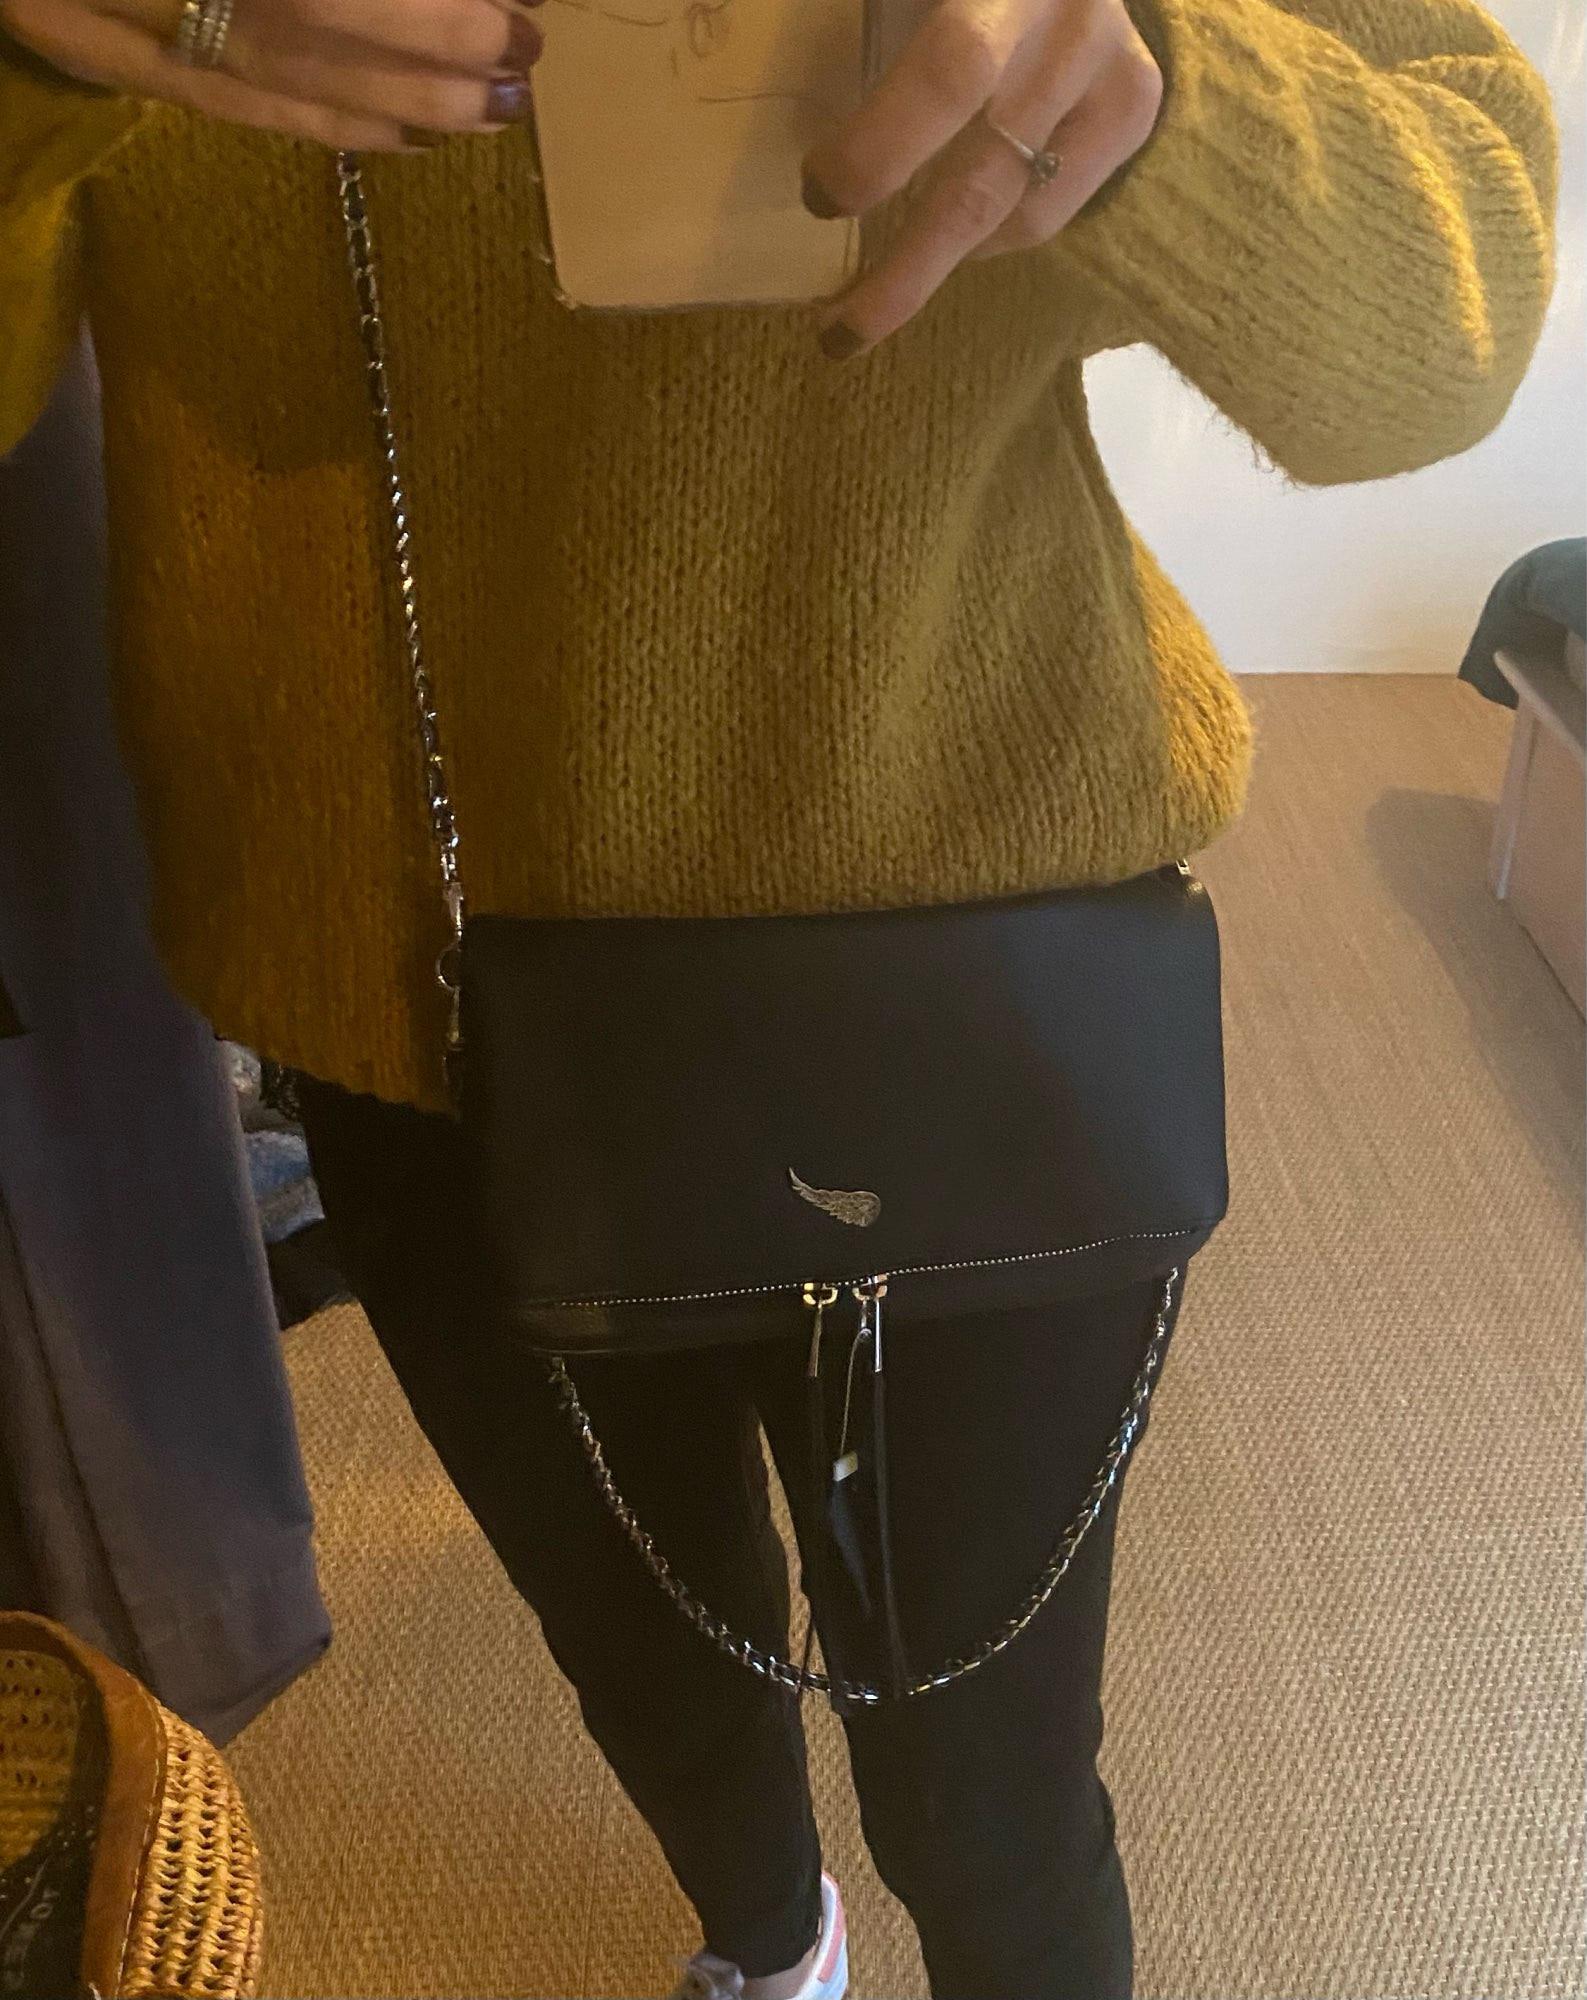 Women Bags 2020 Women's One-shoulder Messenger Bag Fashion Chain Leather Handbag